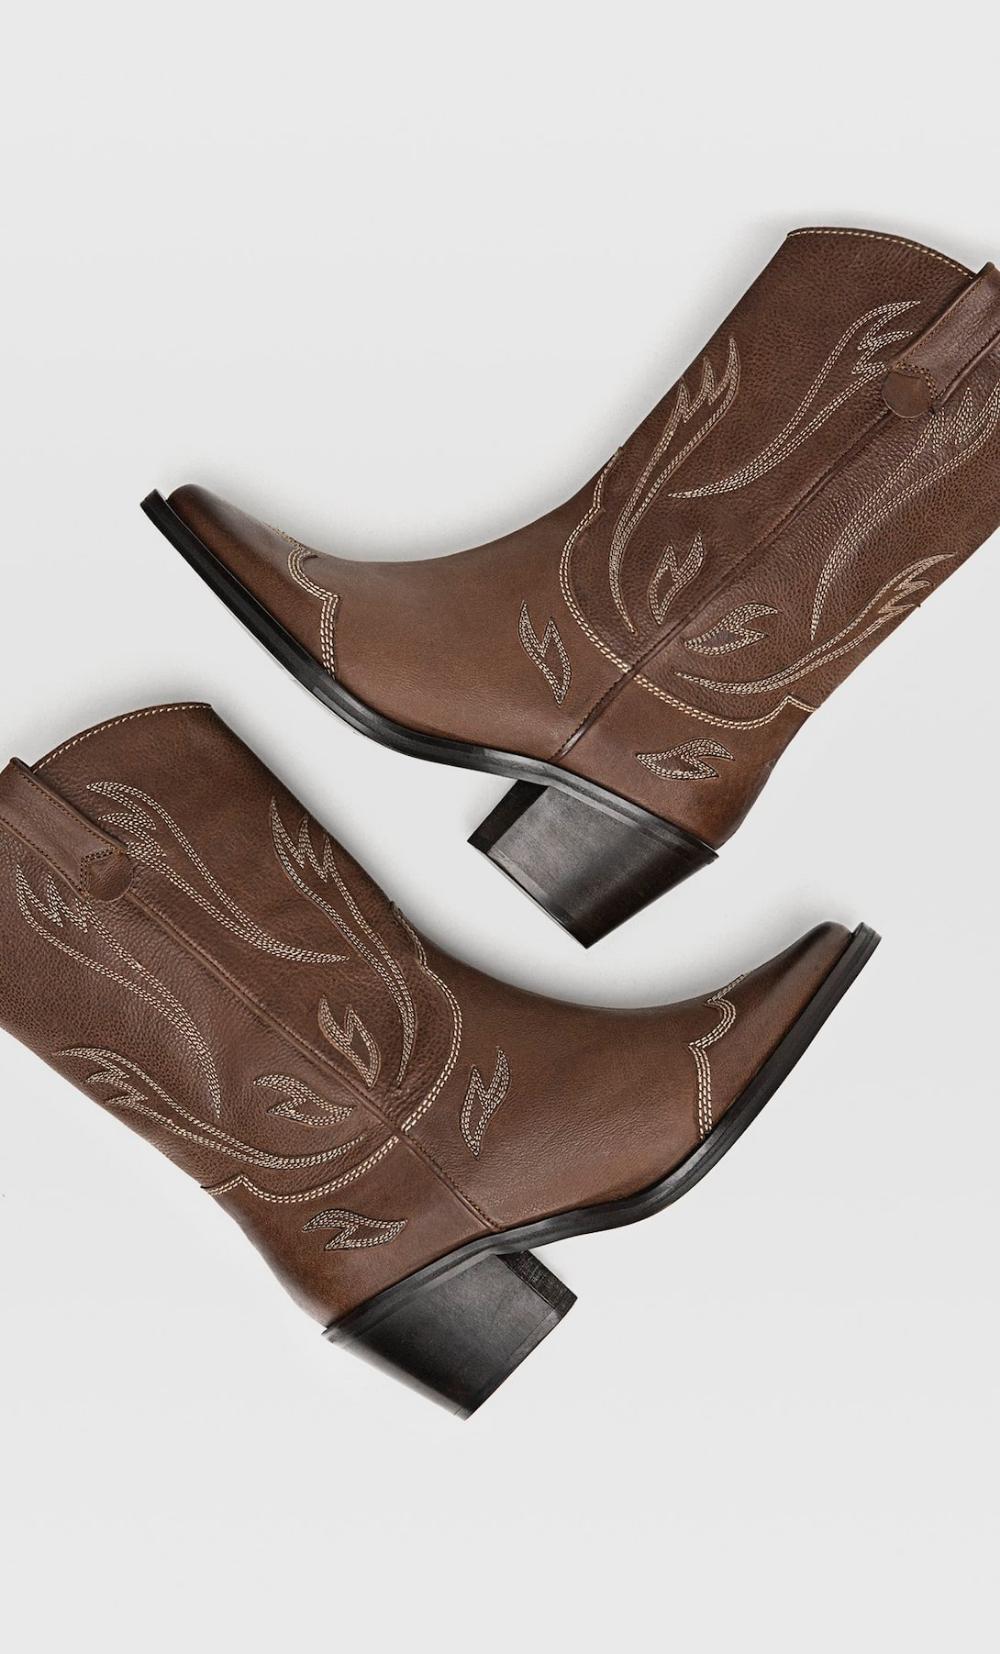 Brazowe Skorzane Kowbojki Null Stradivarius Polska Boots Cowboy Boots Leather Cowboy Boots